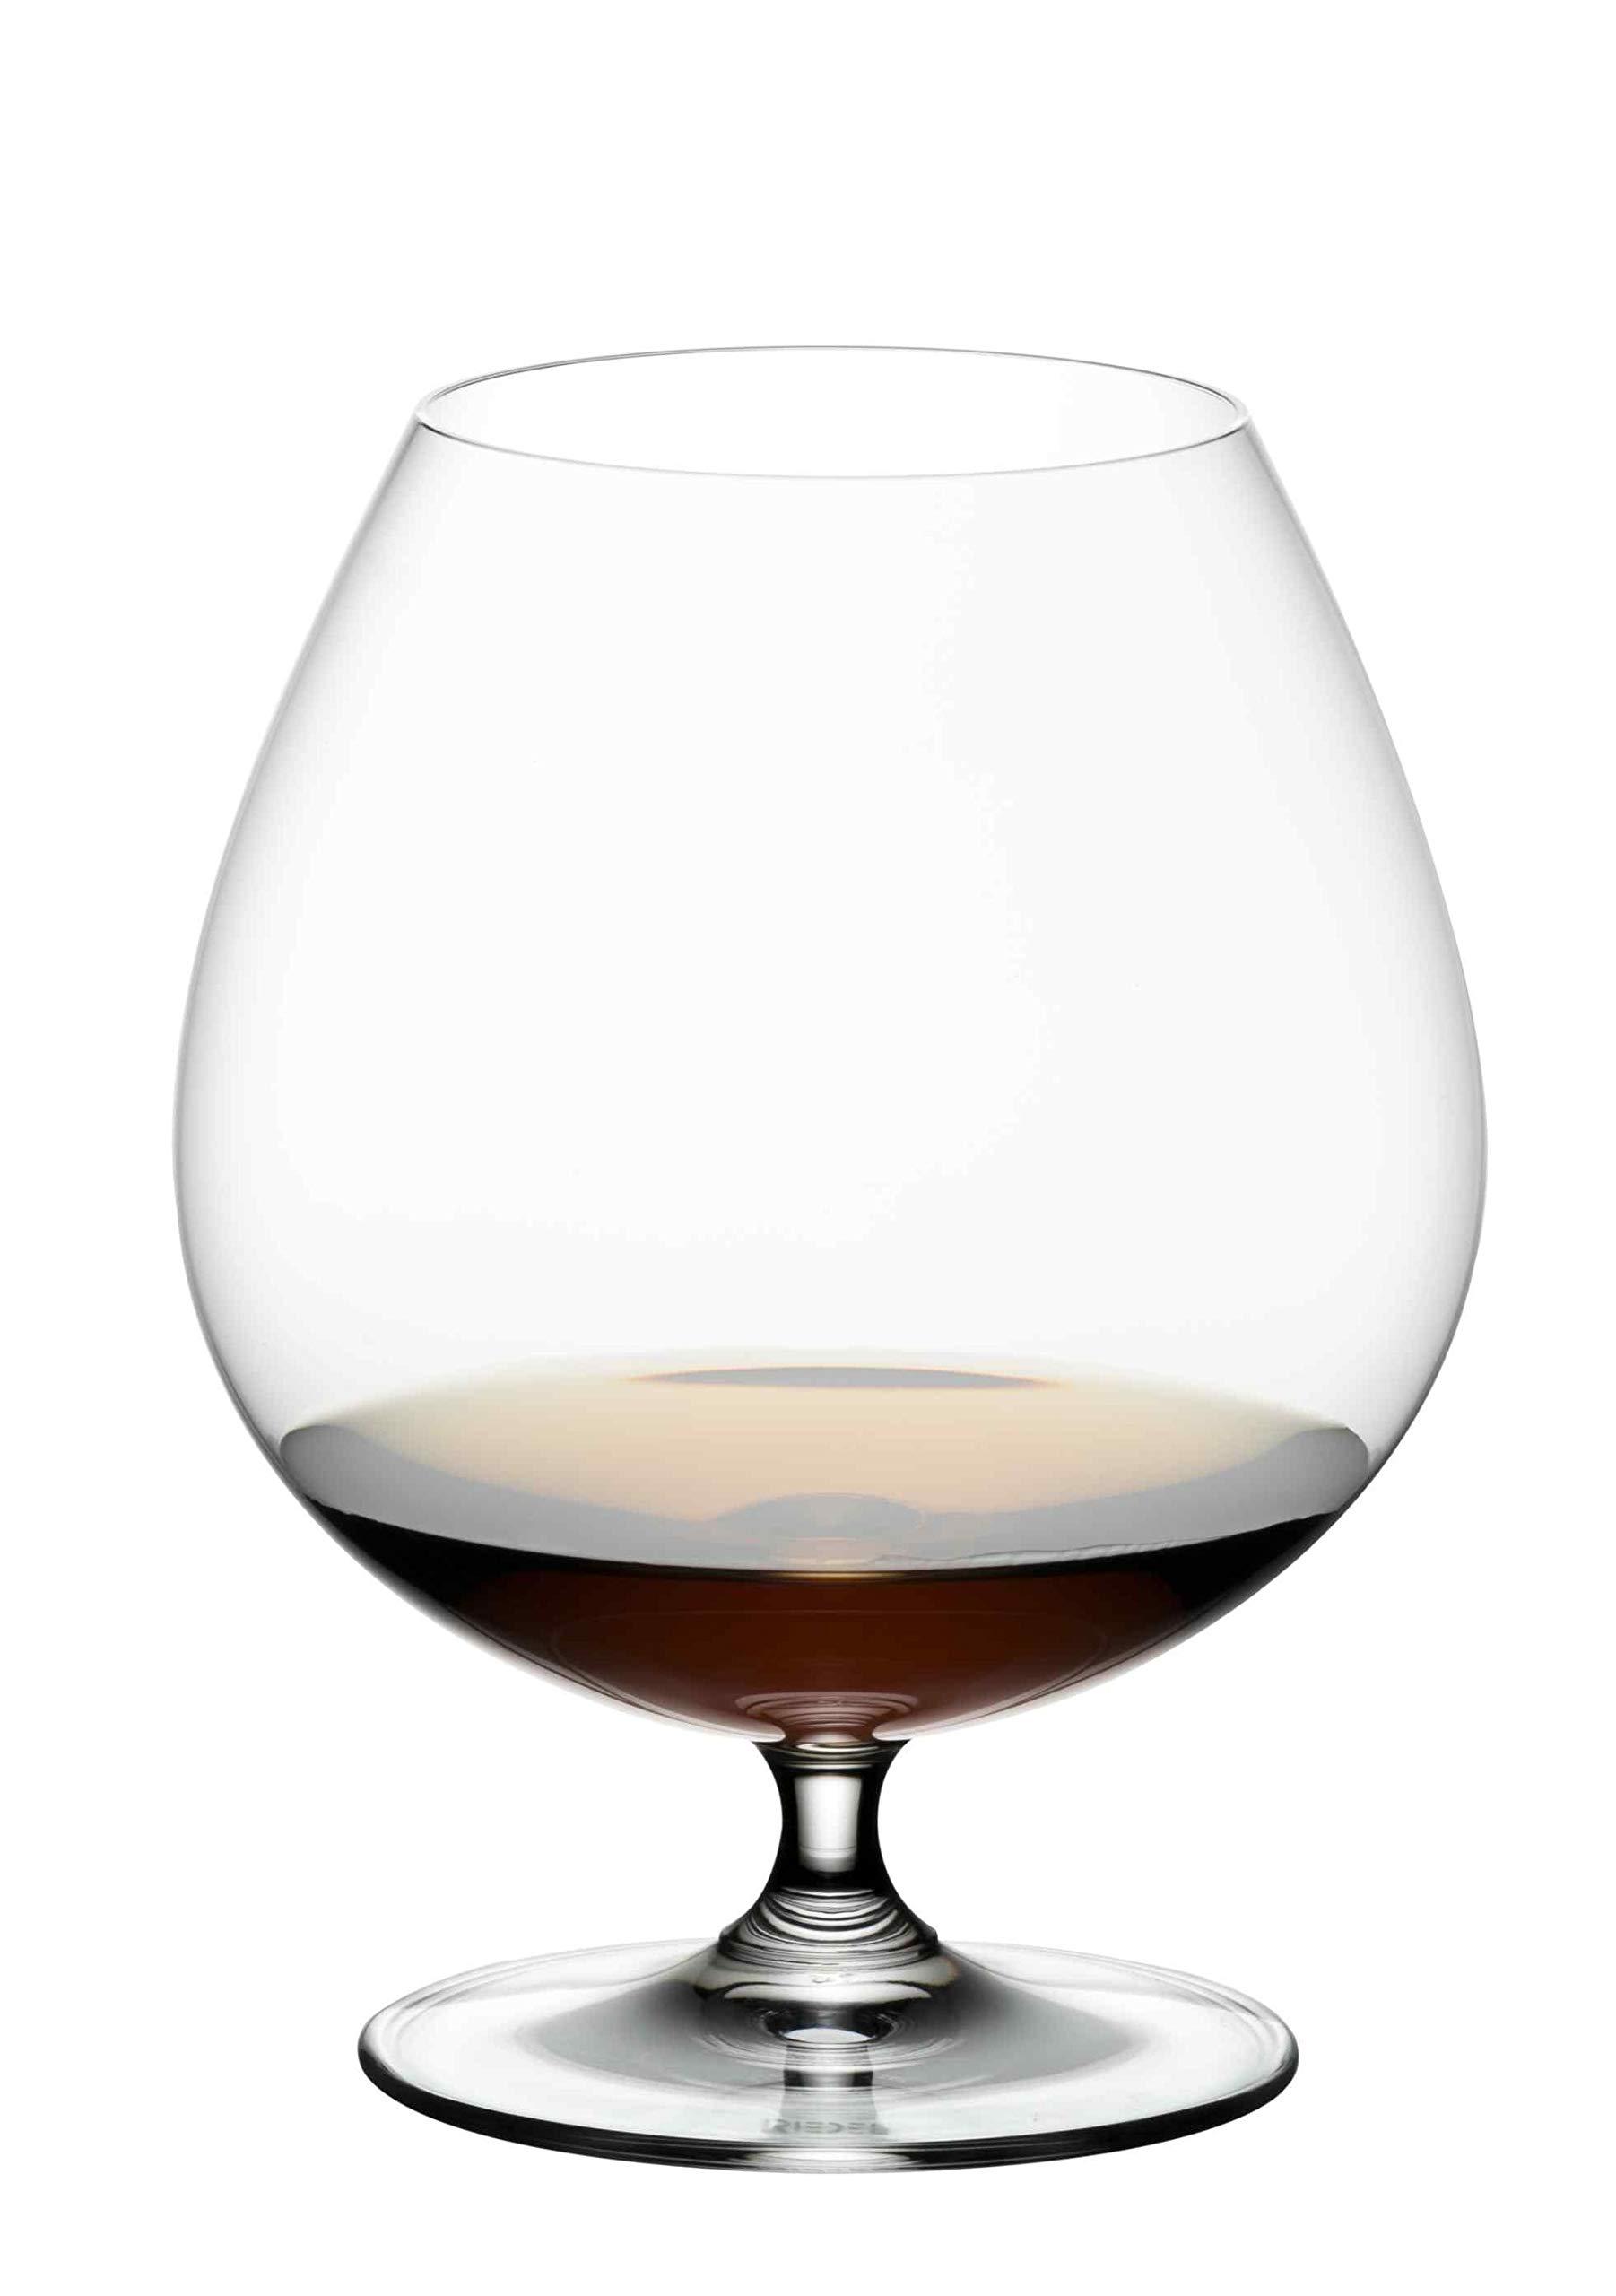 Riedel Vinum Brandy/Cognac Snifter, Set of 4 by Riedel (Image #1)